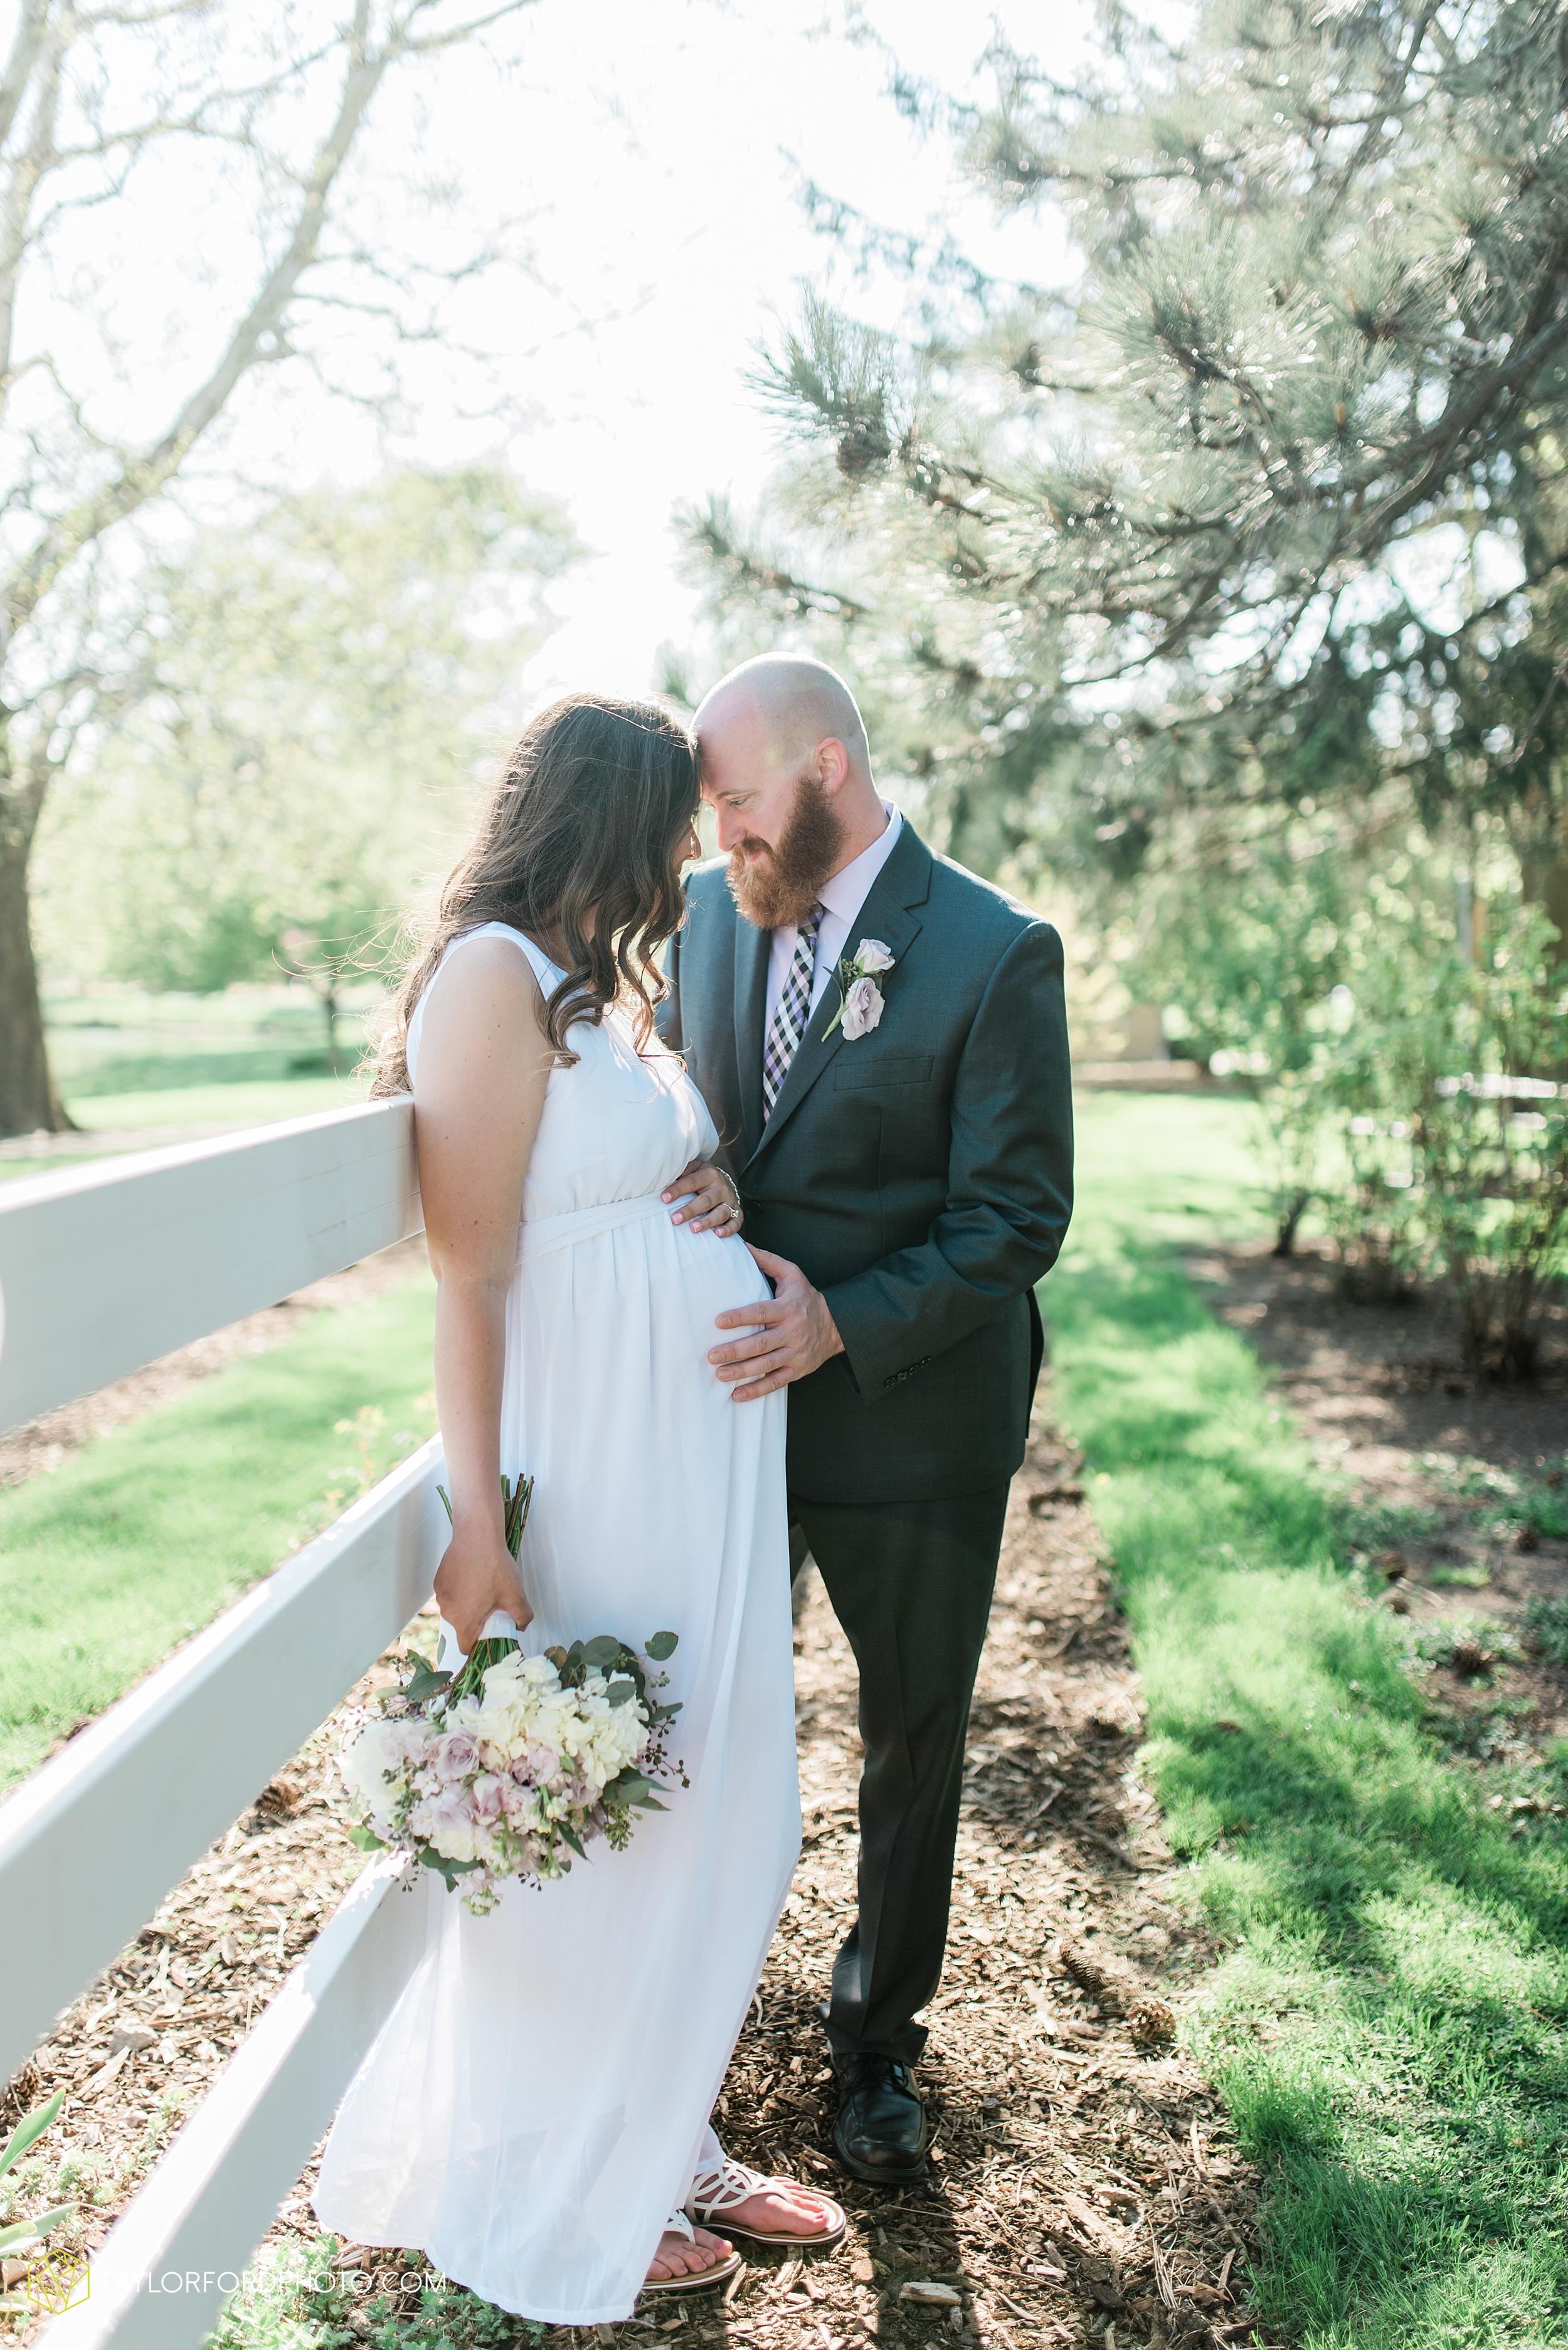 lakeside-rose-gardens-fort-wayne-indiana-elopement-wedding-photographer-Taylor-Ford-Photography_7183.jpg